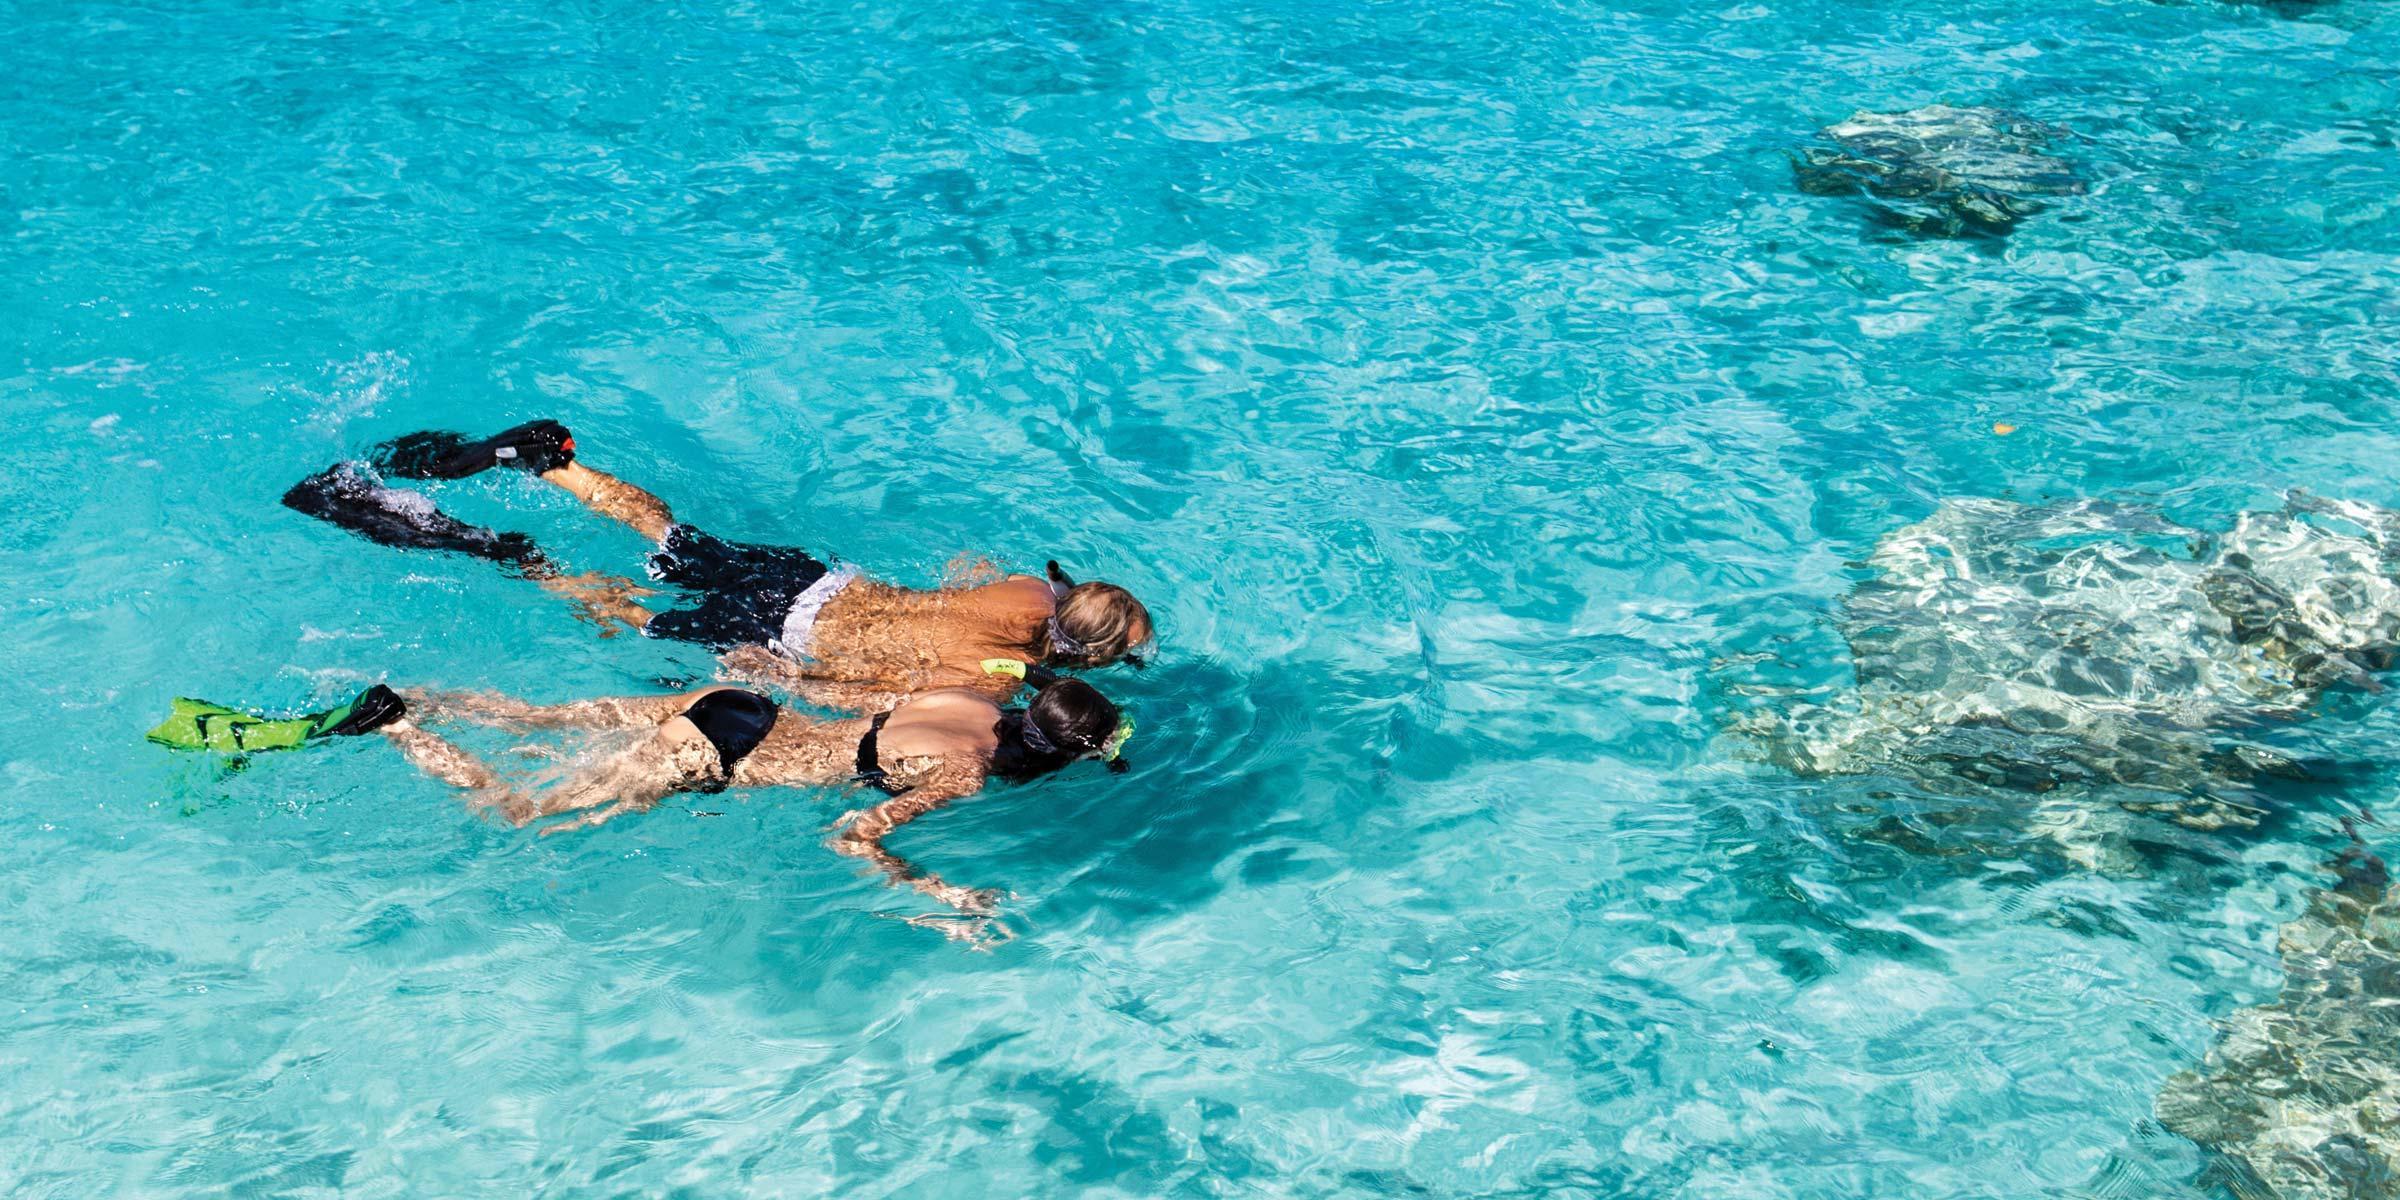 Couple snorkeling on St. John, U.S. Virgin Islands